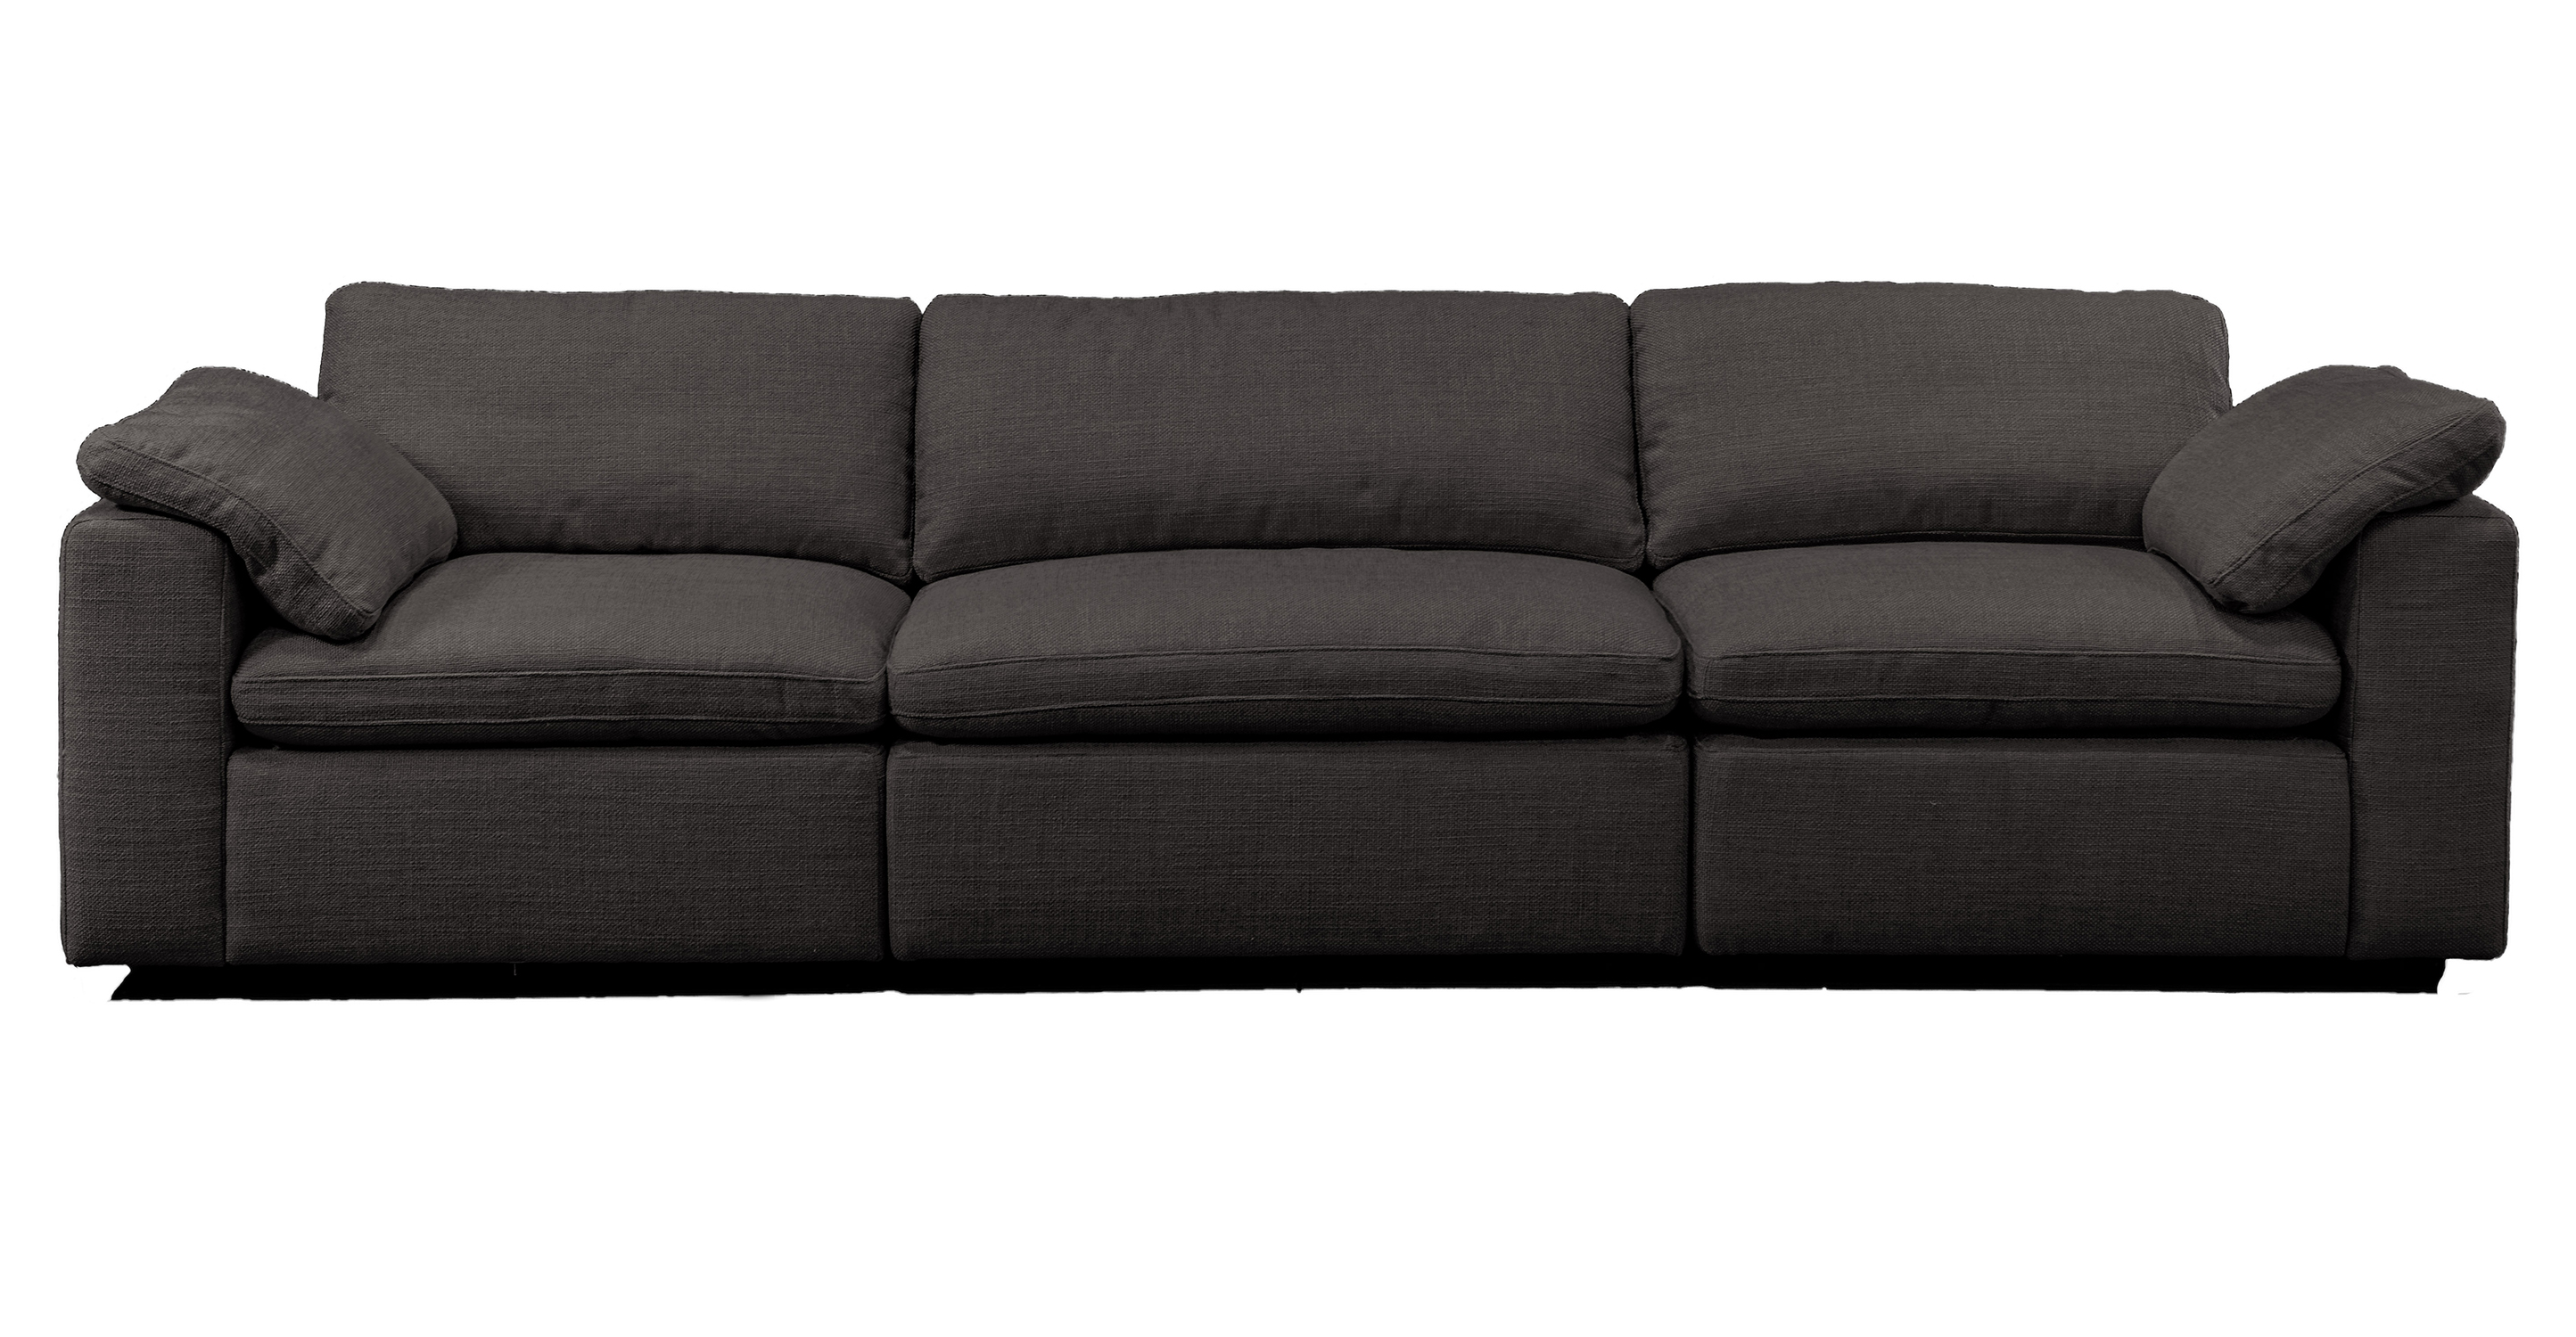 "Nest Modular 120"" Finch 3-pc Fabric Sofa Sectional, Dior Grey"